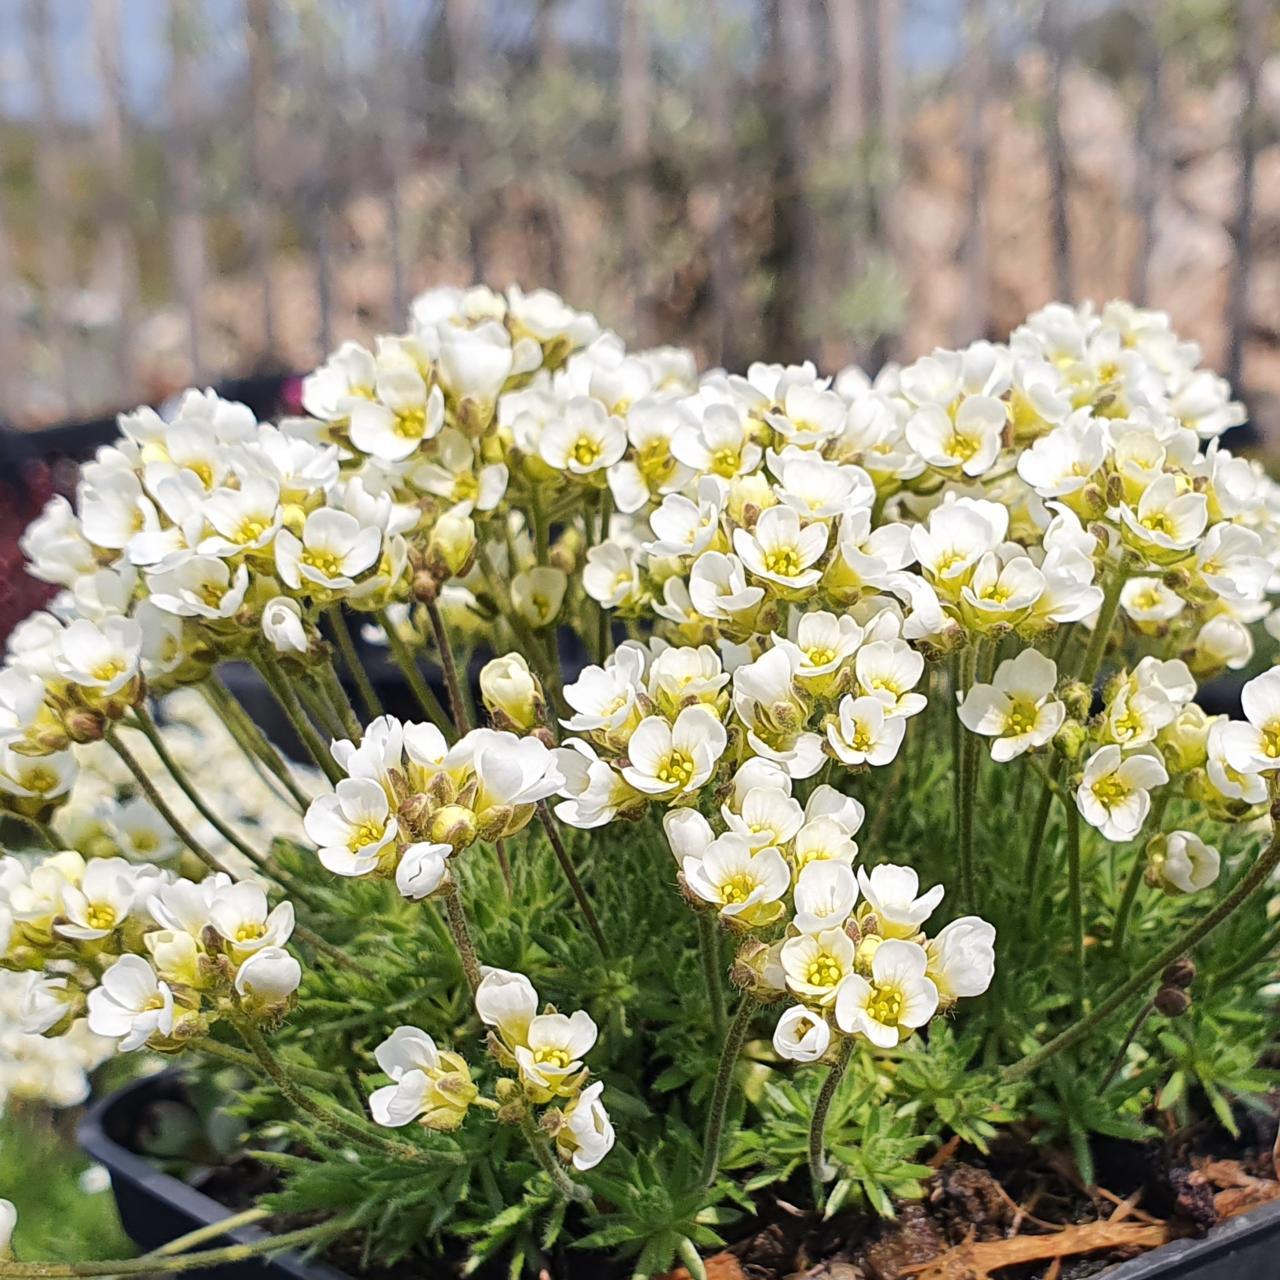 Draba suendermannii plant